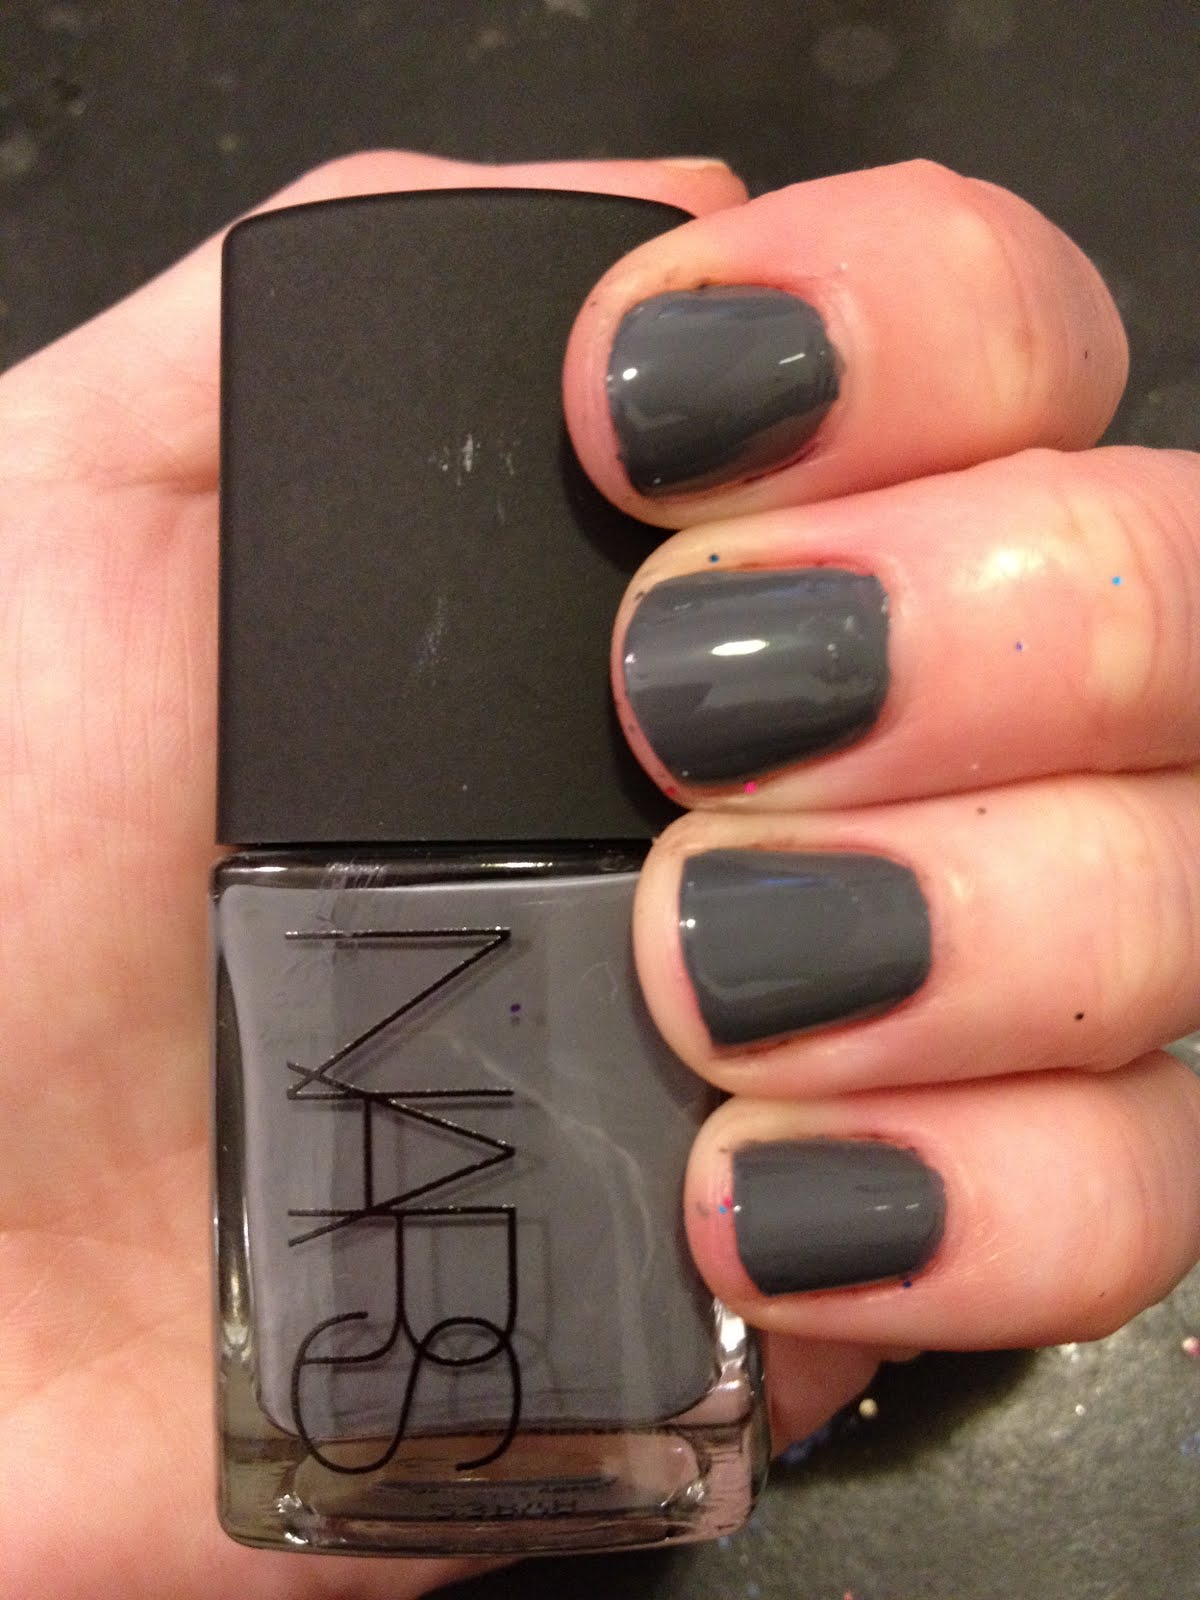 The Beauty of Life: NARS Nail Polish Swatches: My Top 3 Picks!